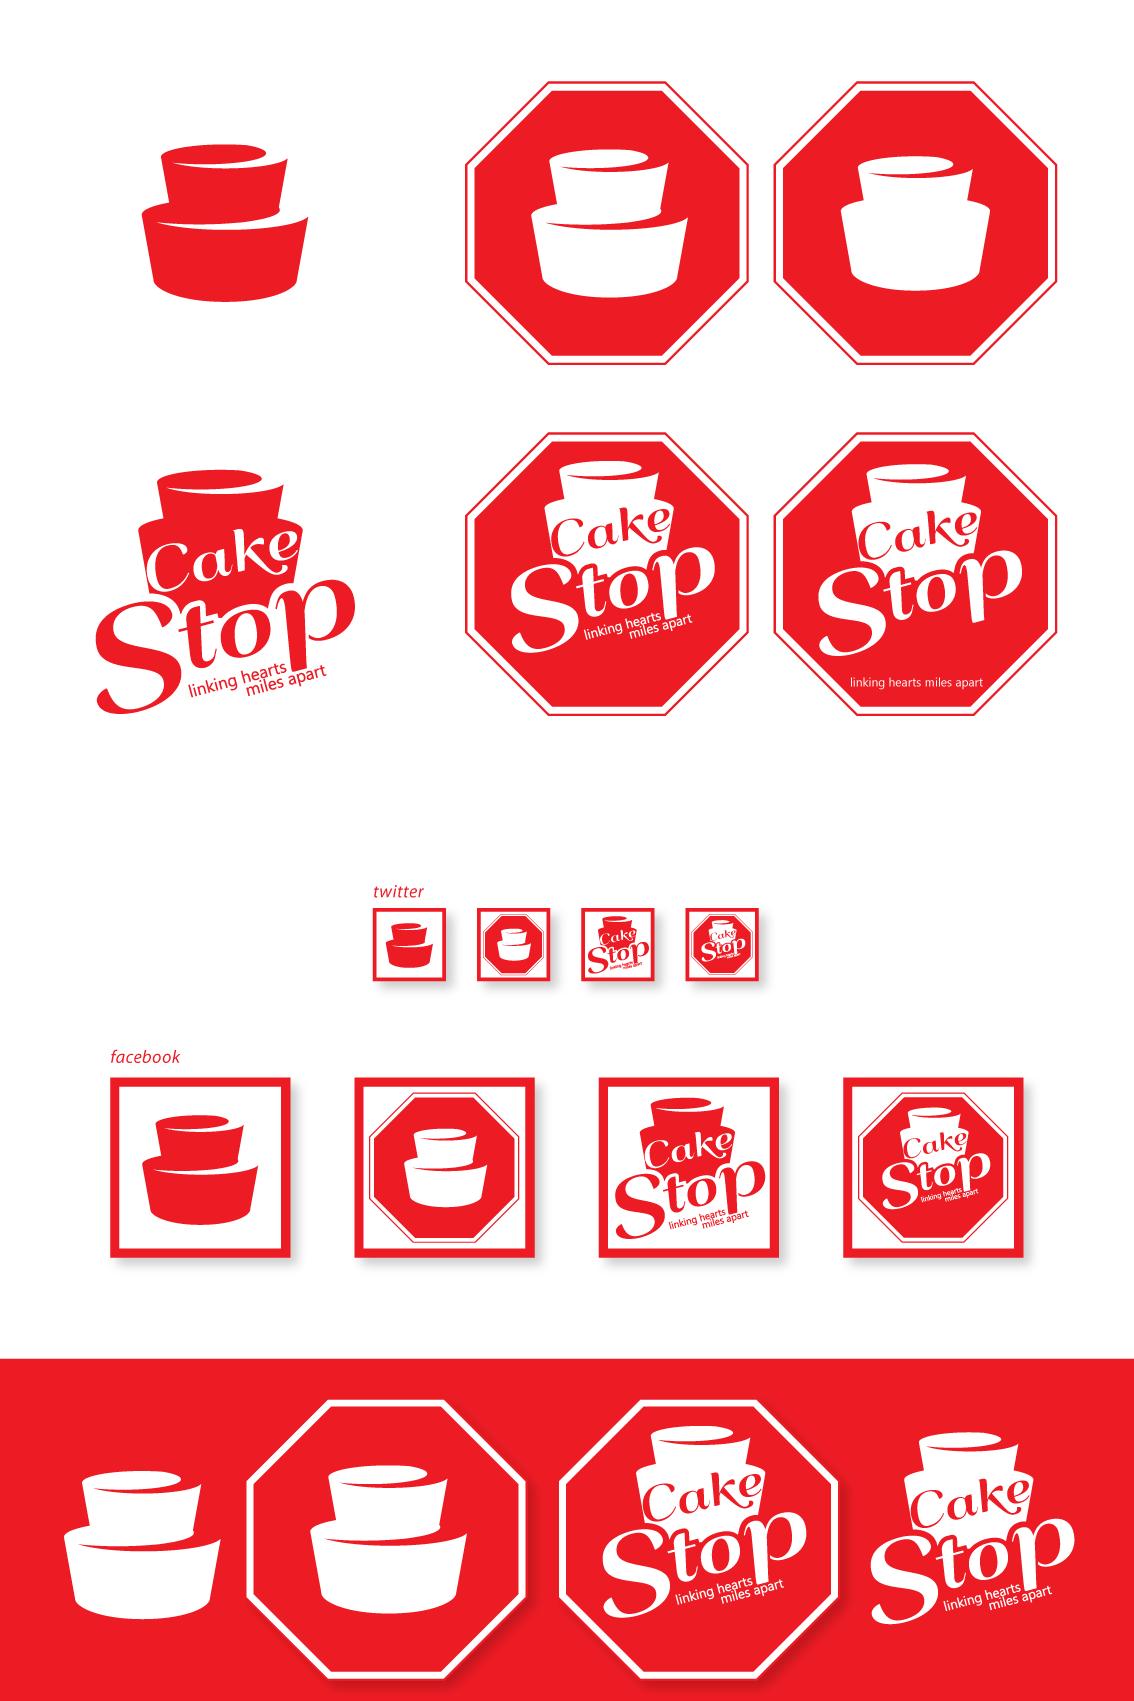 Cake Stop needs a new logo